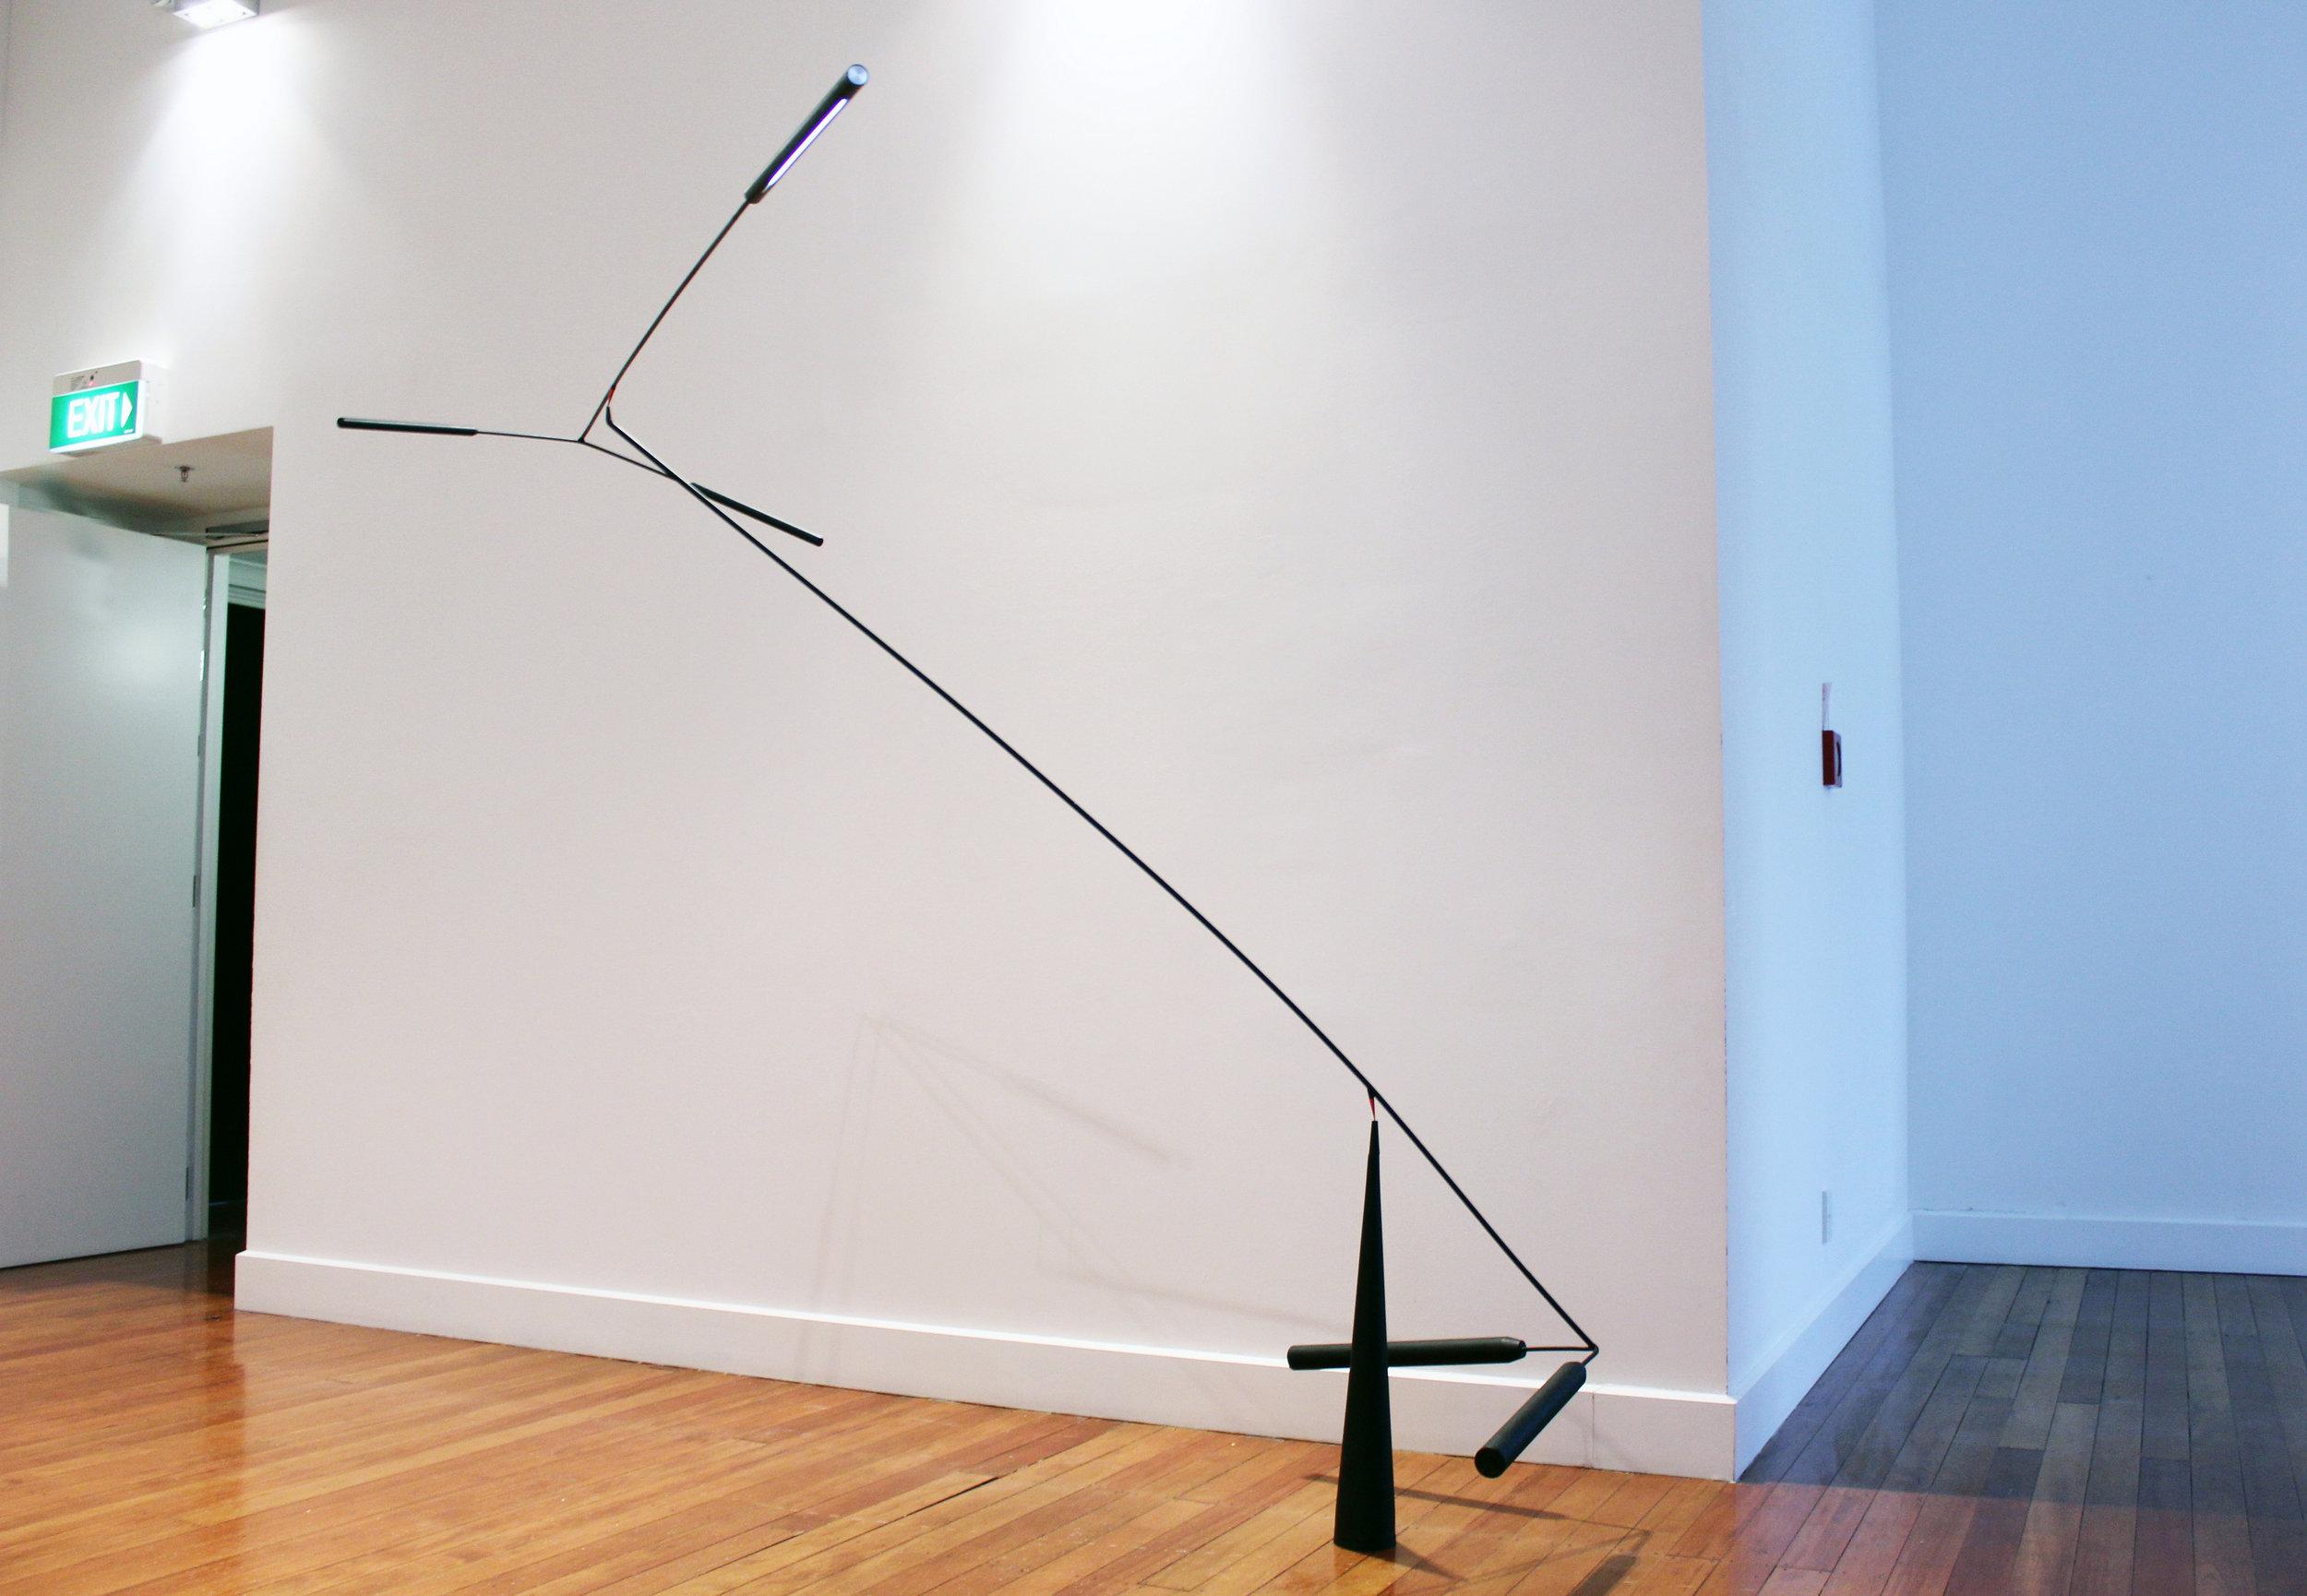 100 grams. Adam Ben-Dror. Victoria University.